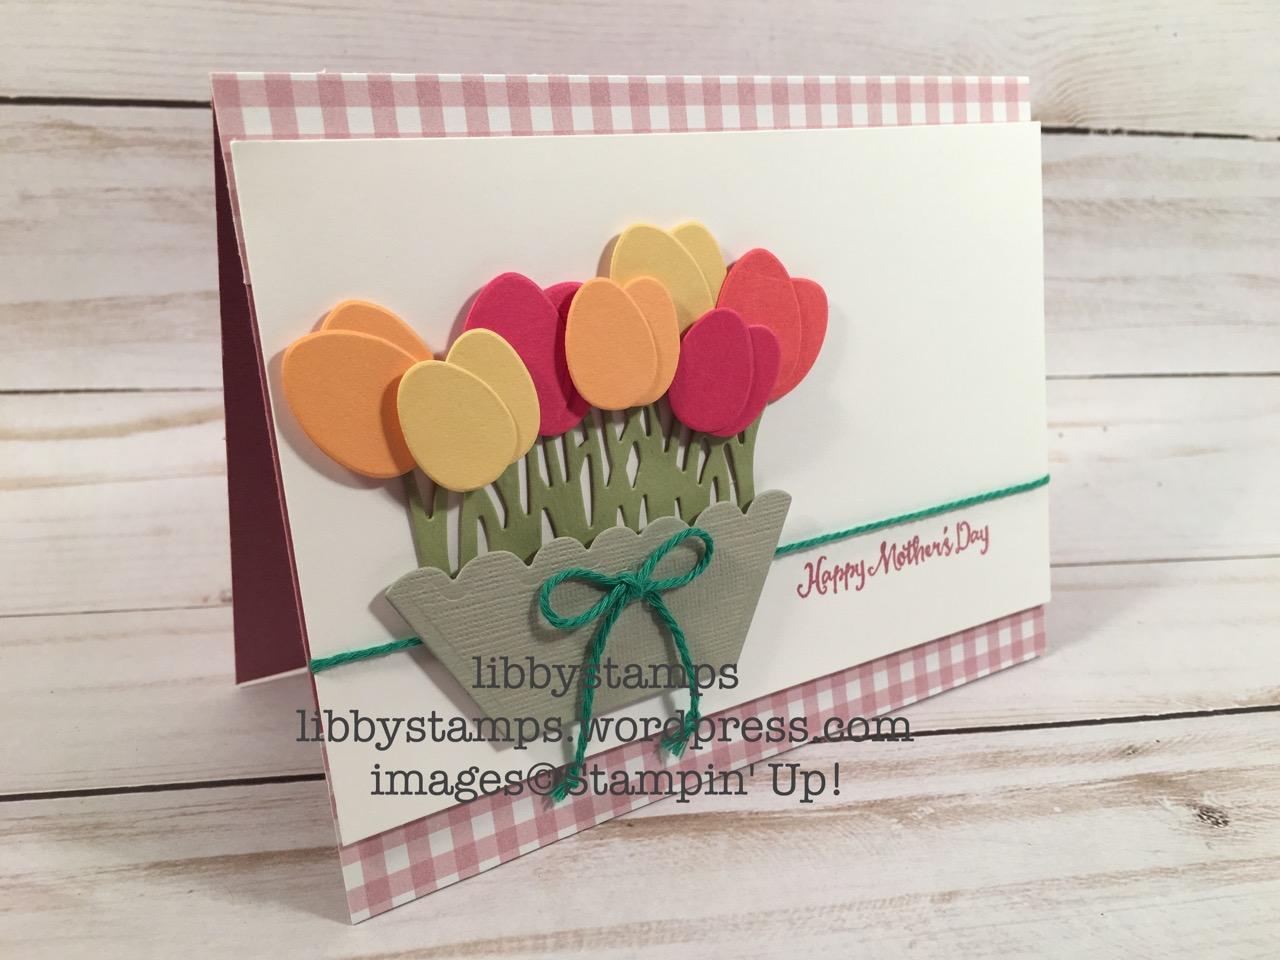 libbystamps, stampin up, Basket Builder Framelits, Oh So Succulent, Window Box Thinlits, Succulent Garden DSP, Emerald Envy Baker's Twine, CCMC